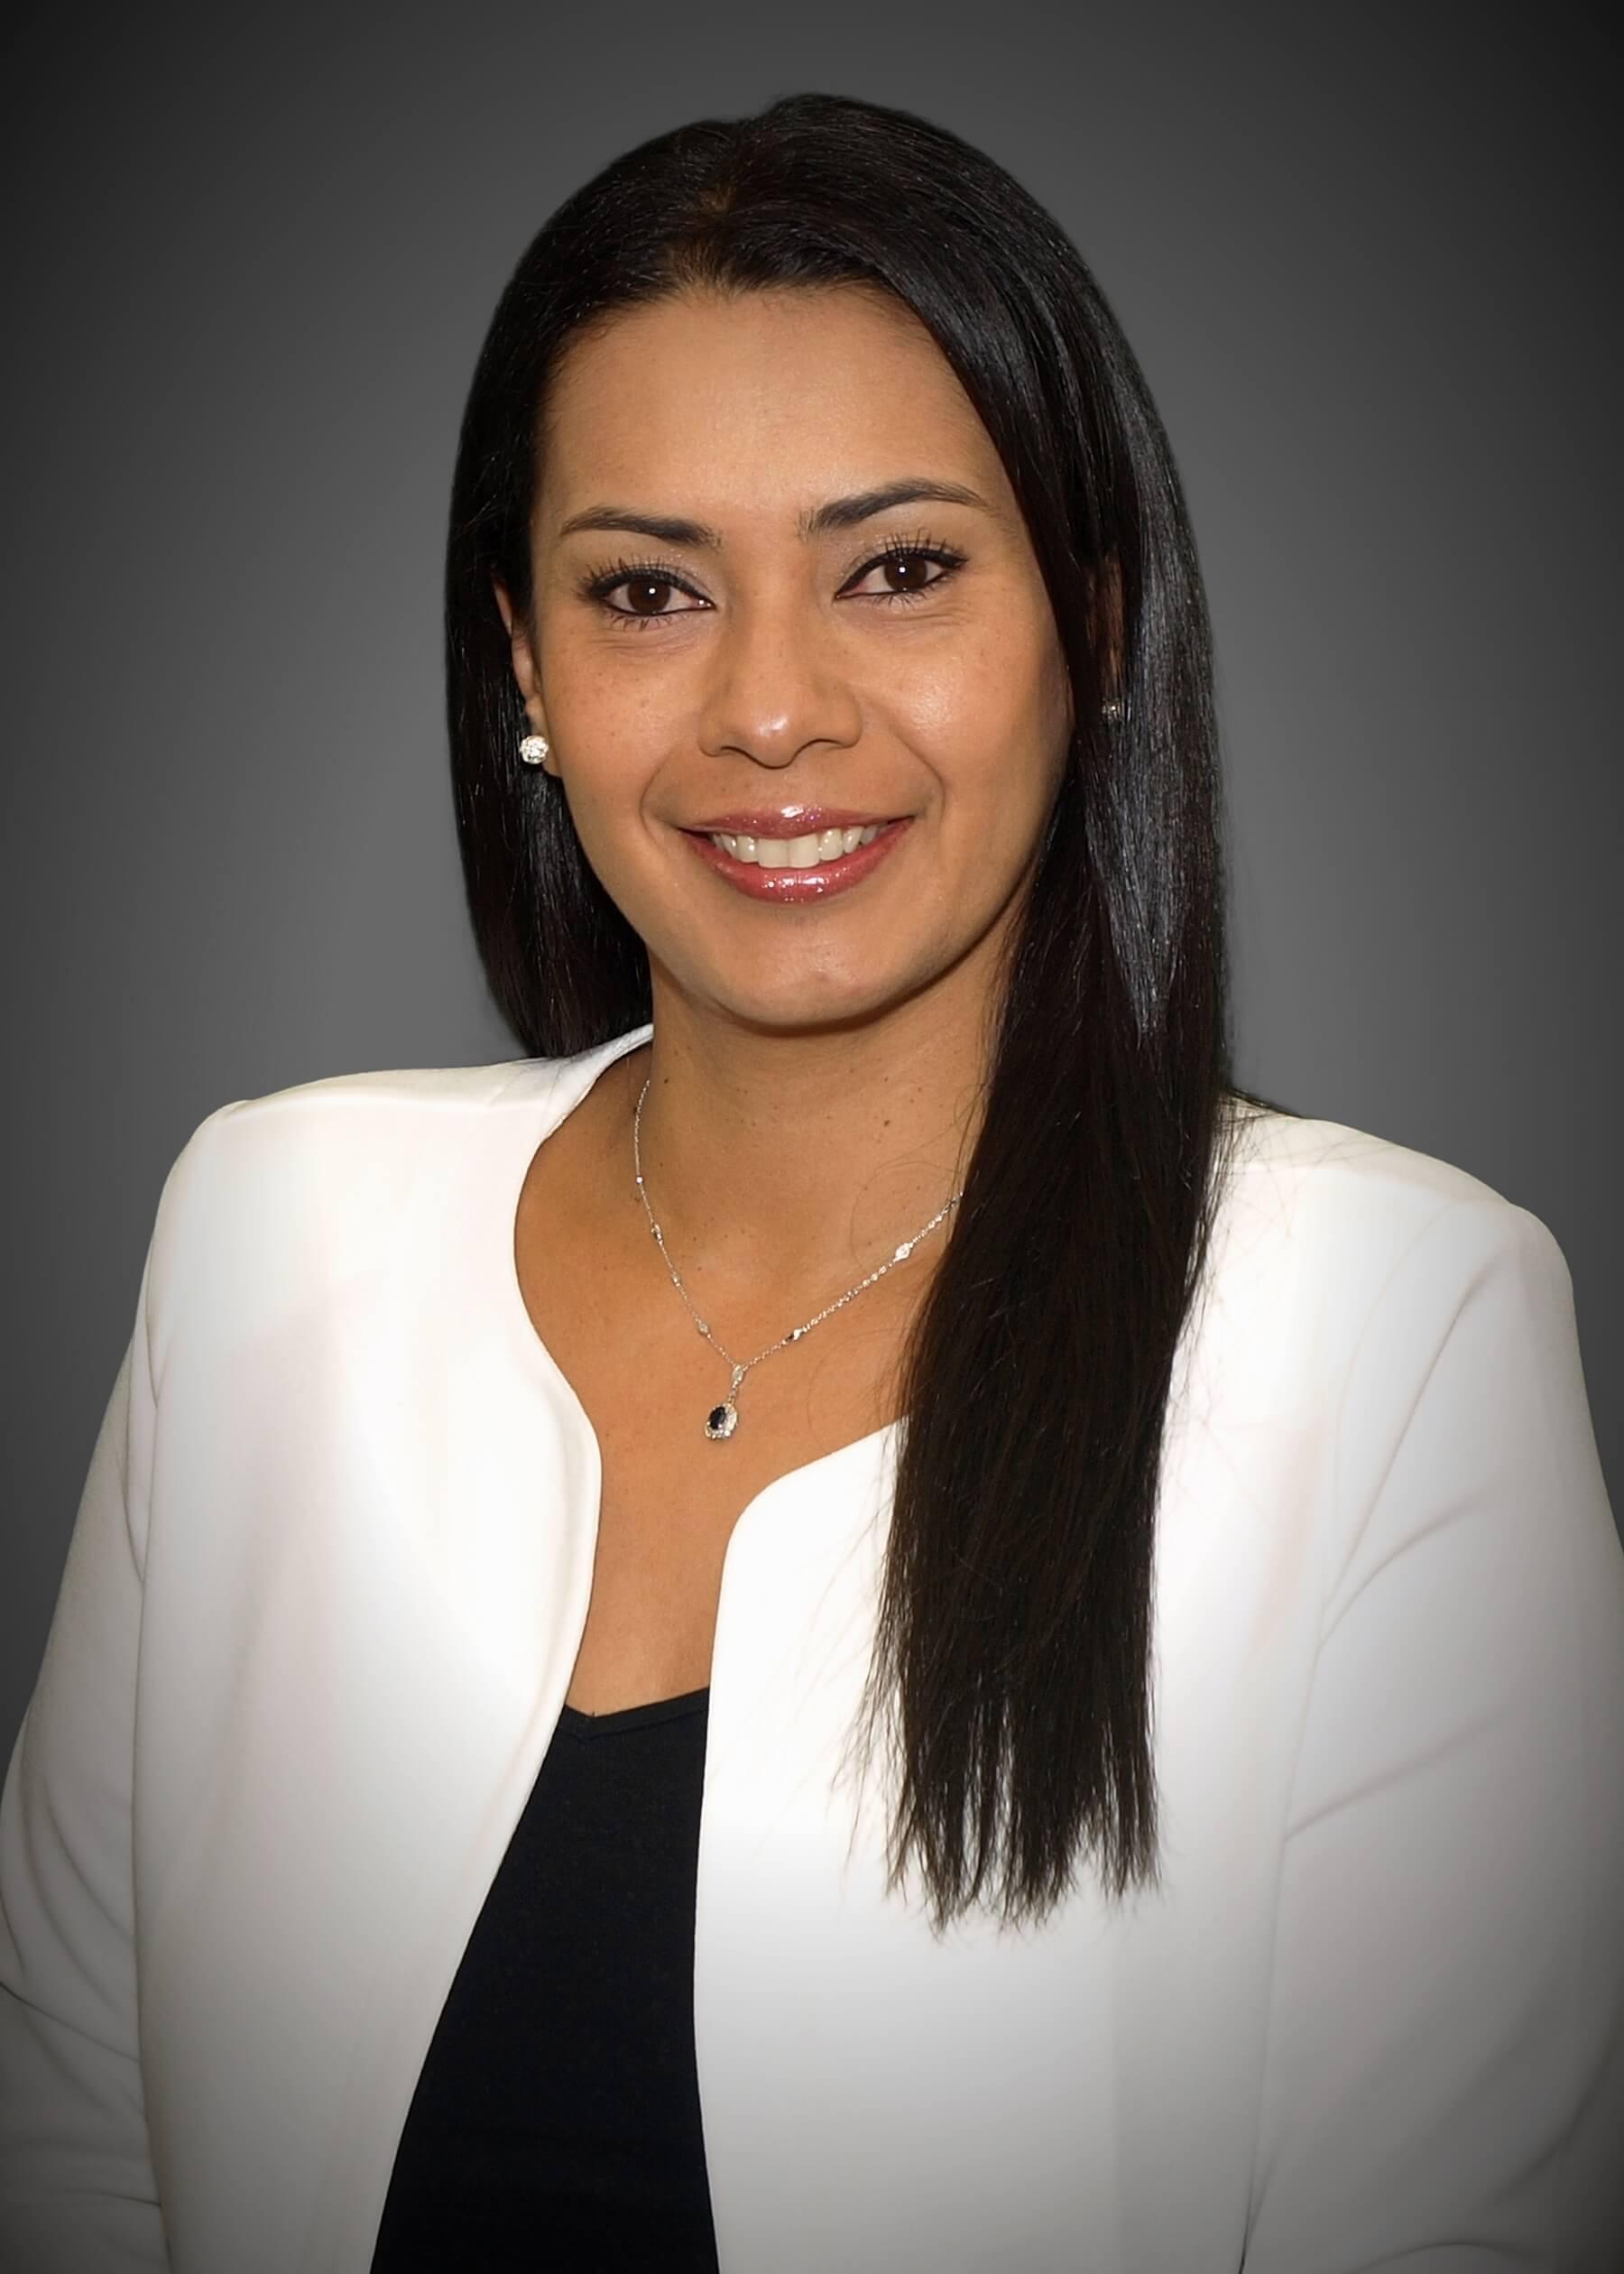 Adrianna Vargas